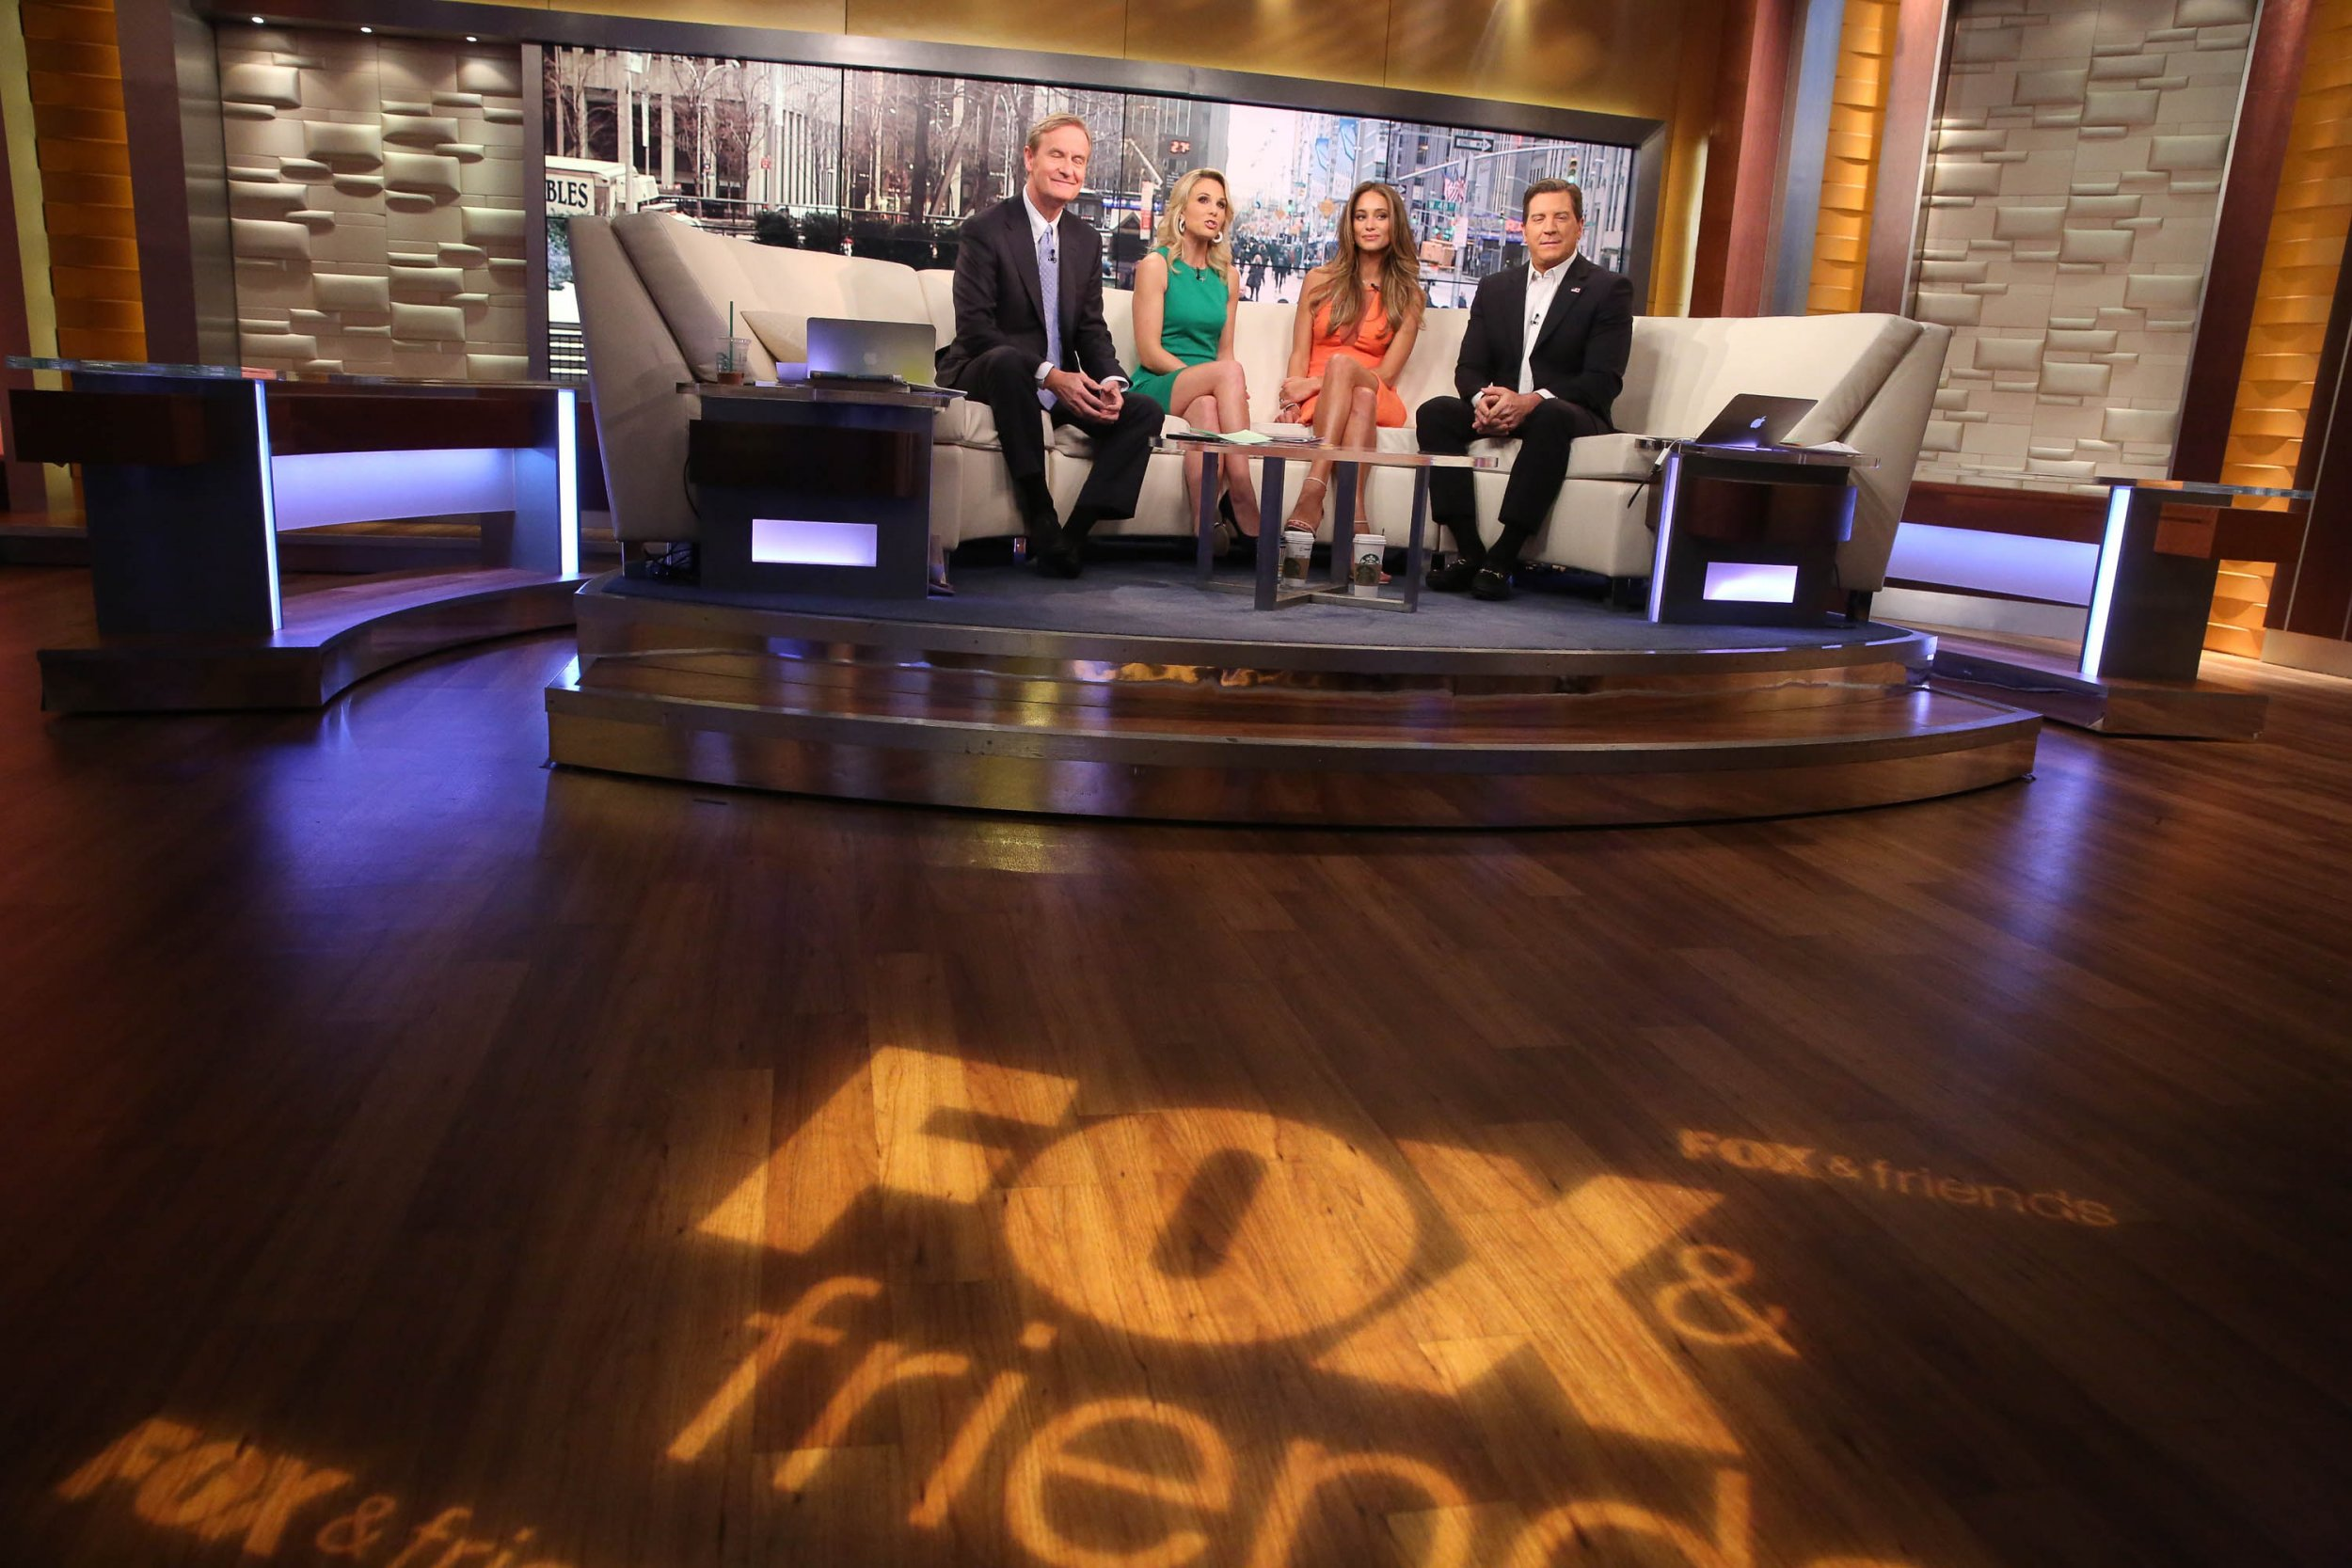 fox and friends pruitt fed script